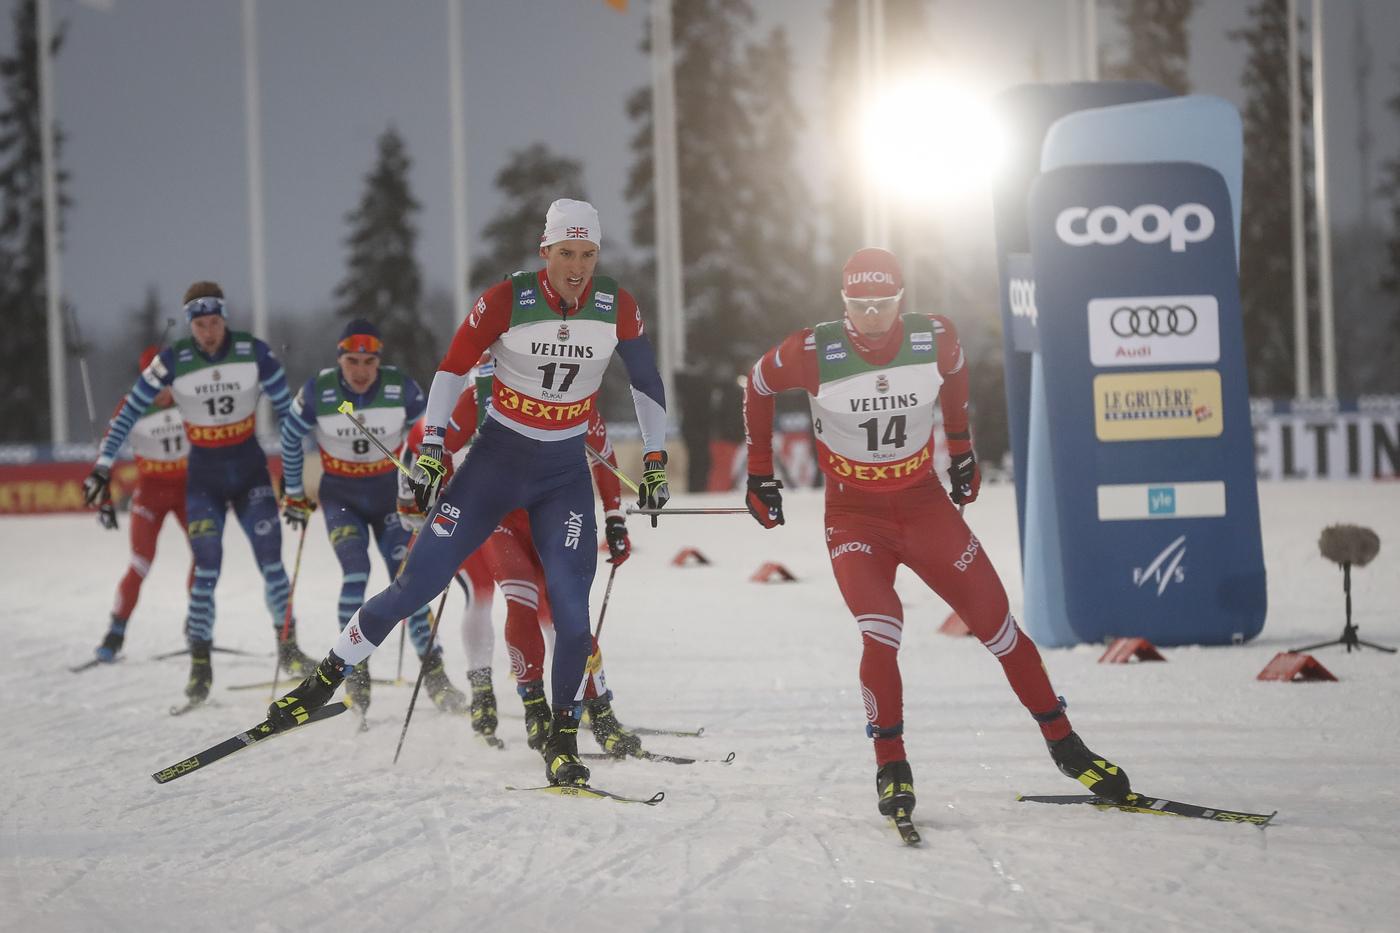 LIVE Sci di fondo, Skiathlon Lahti in DIRETTA: tornano i norvegesi, perché l'Italia è assente